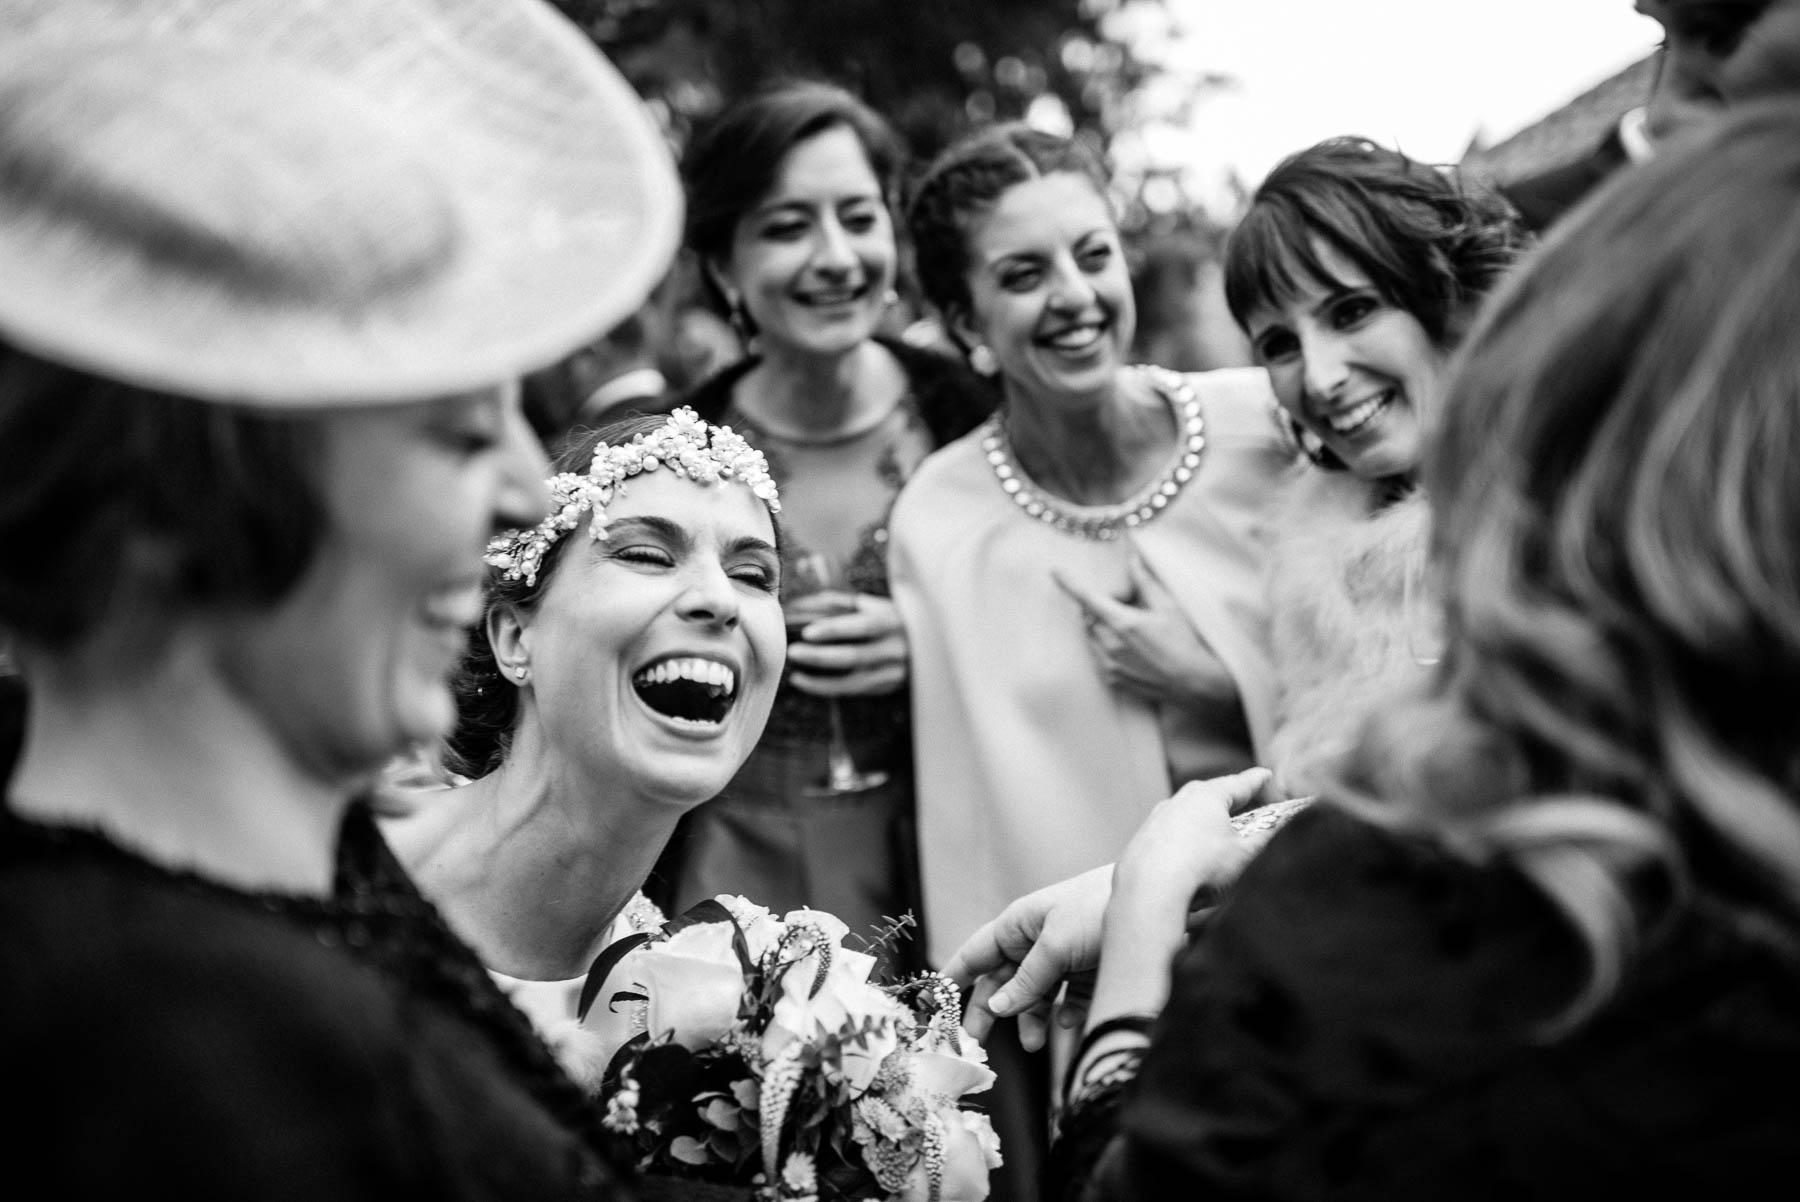 fotografo de boda en santiago de compostela